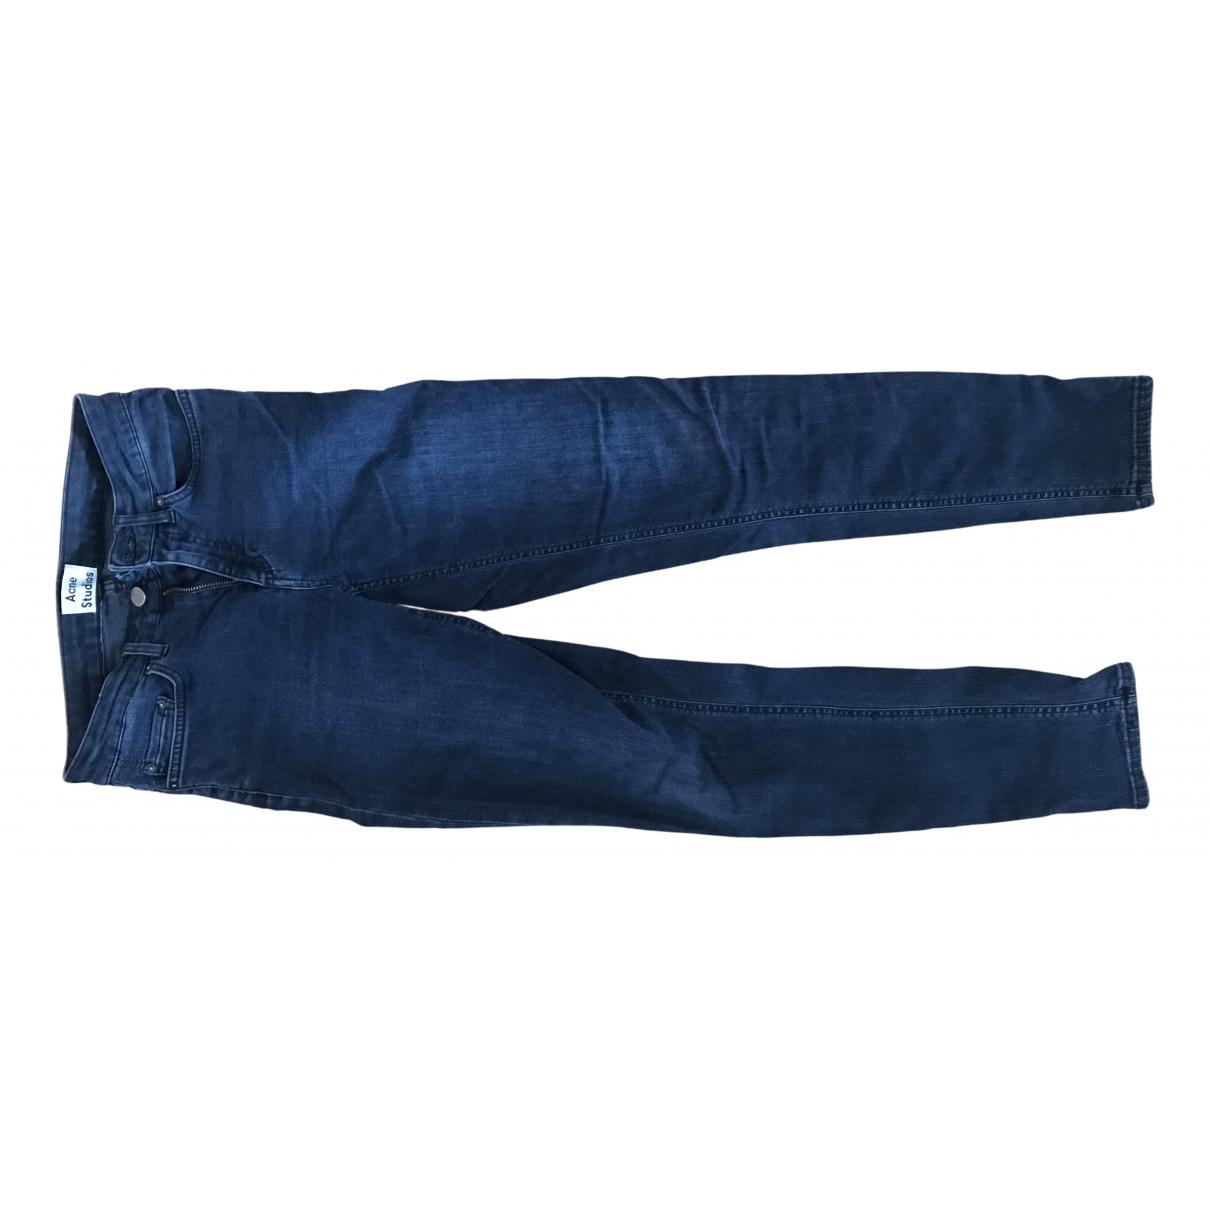 Acne Studios Skin 5 Navy Cotton Jeans for Women 25 US